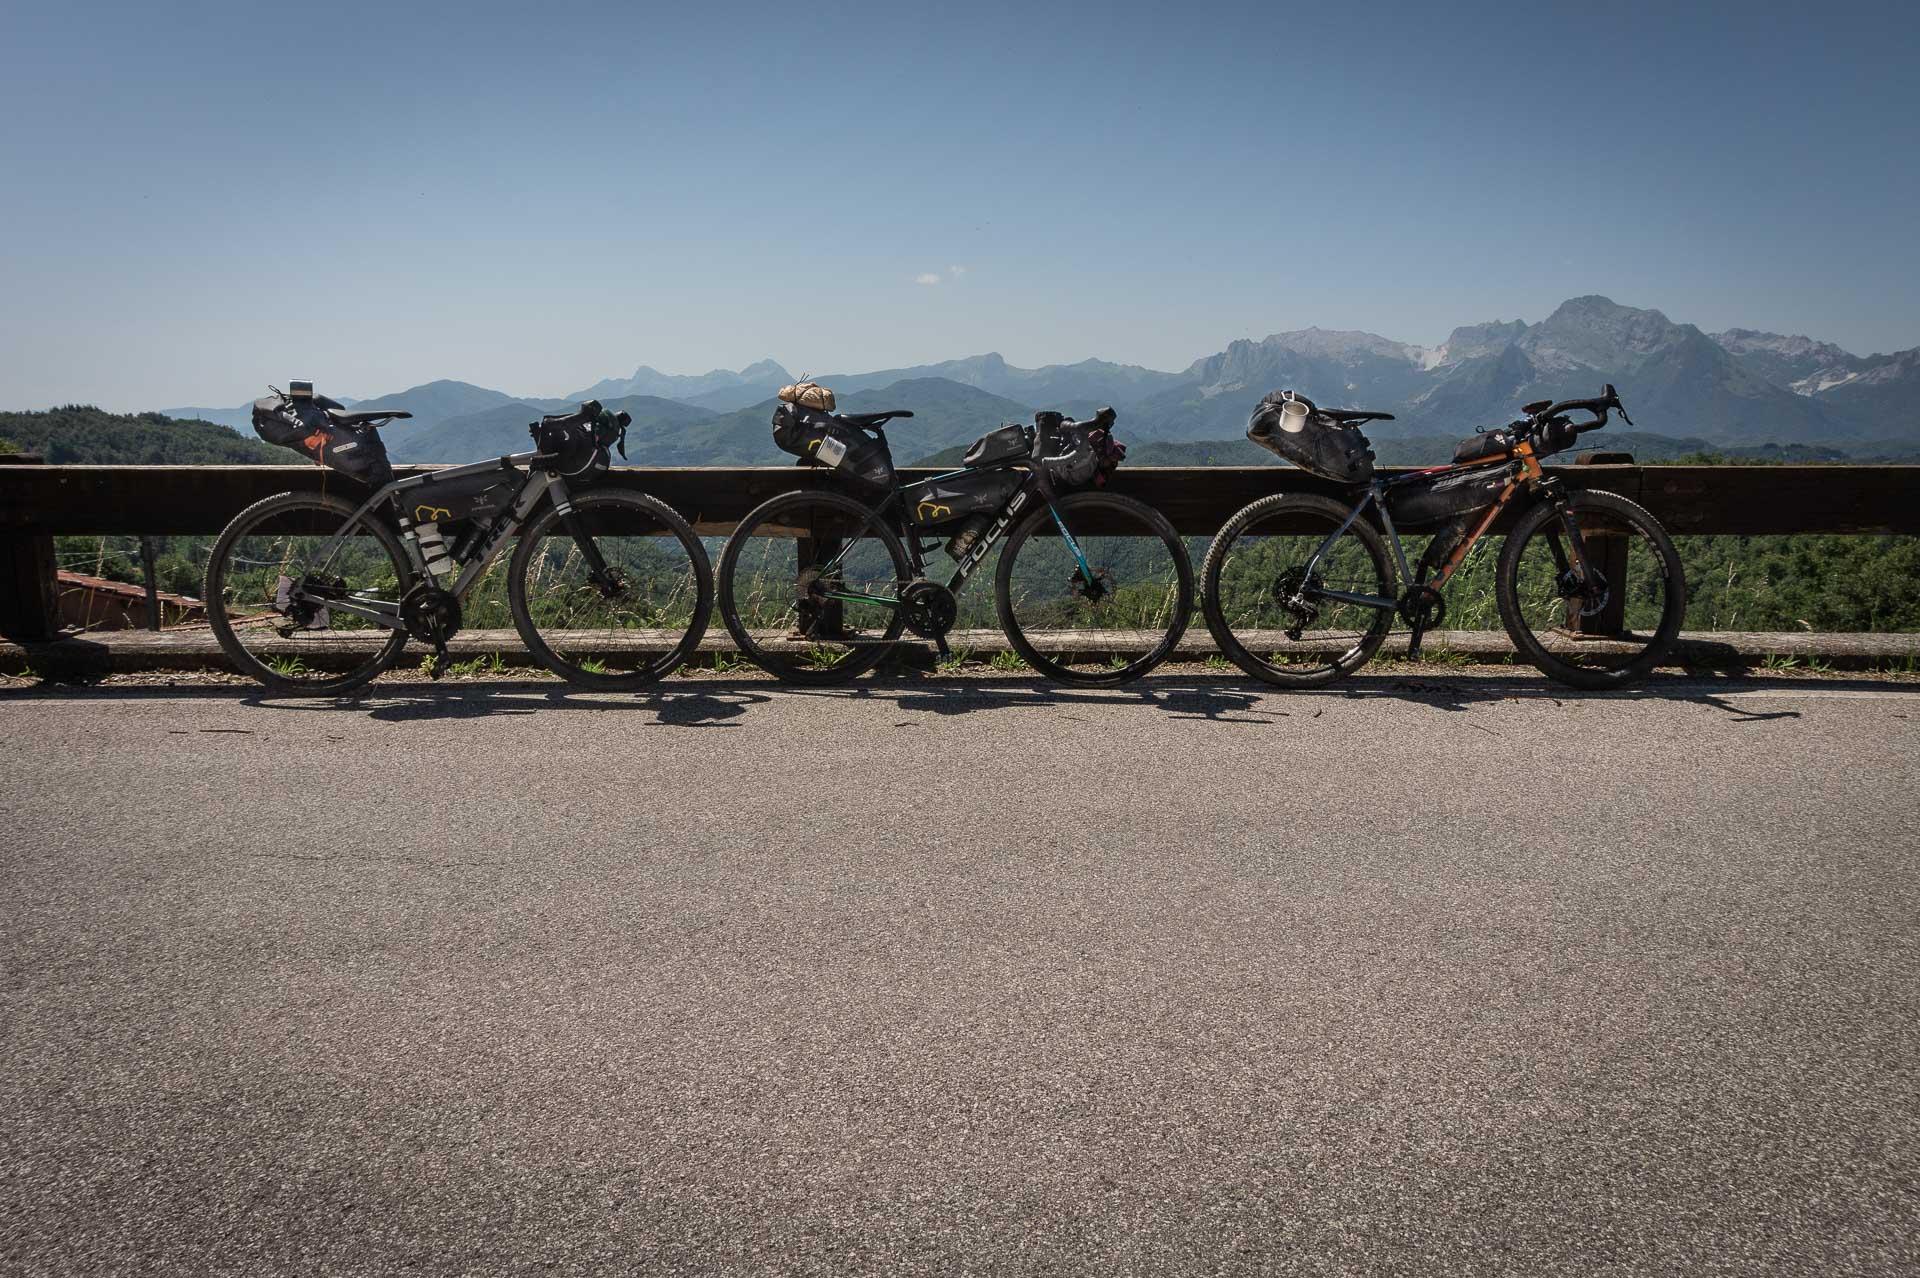 bikepacking-garfagnana (27 di 31)